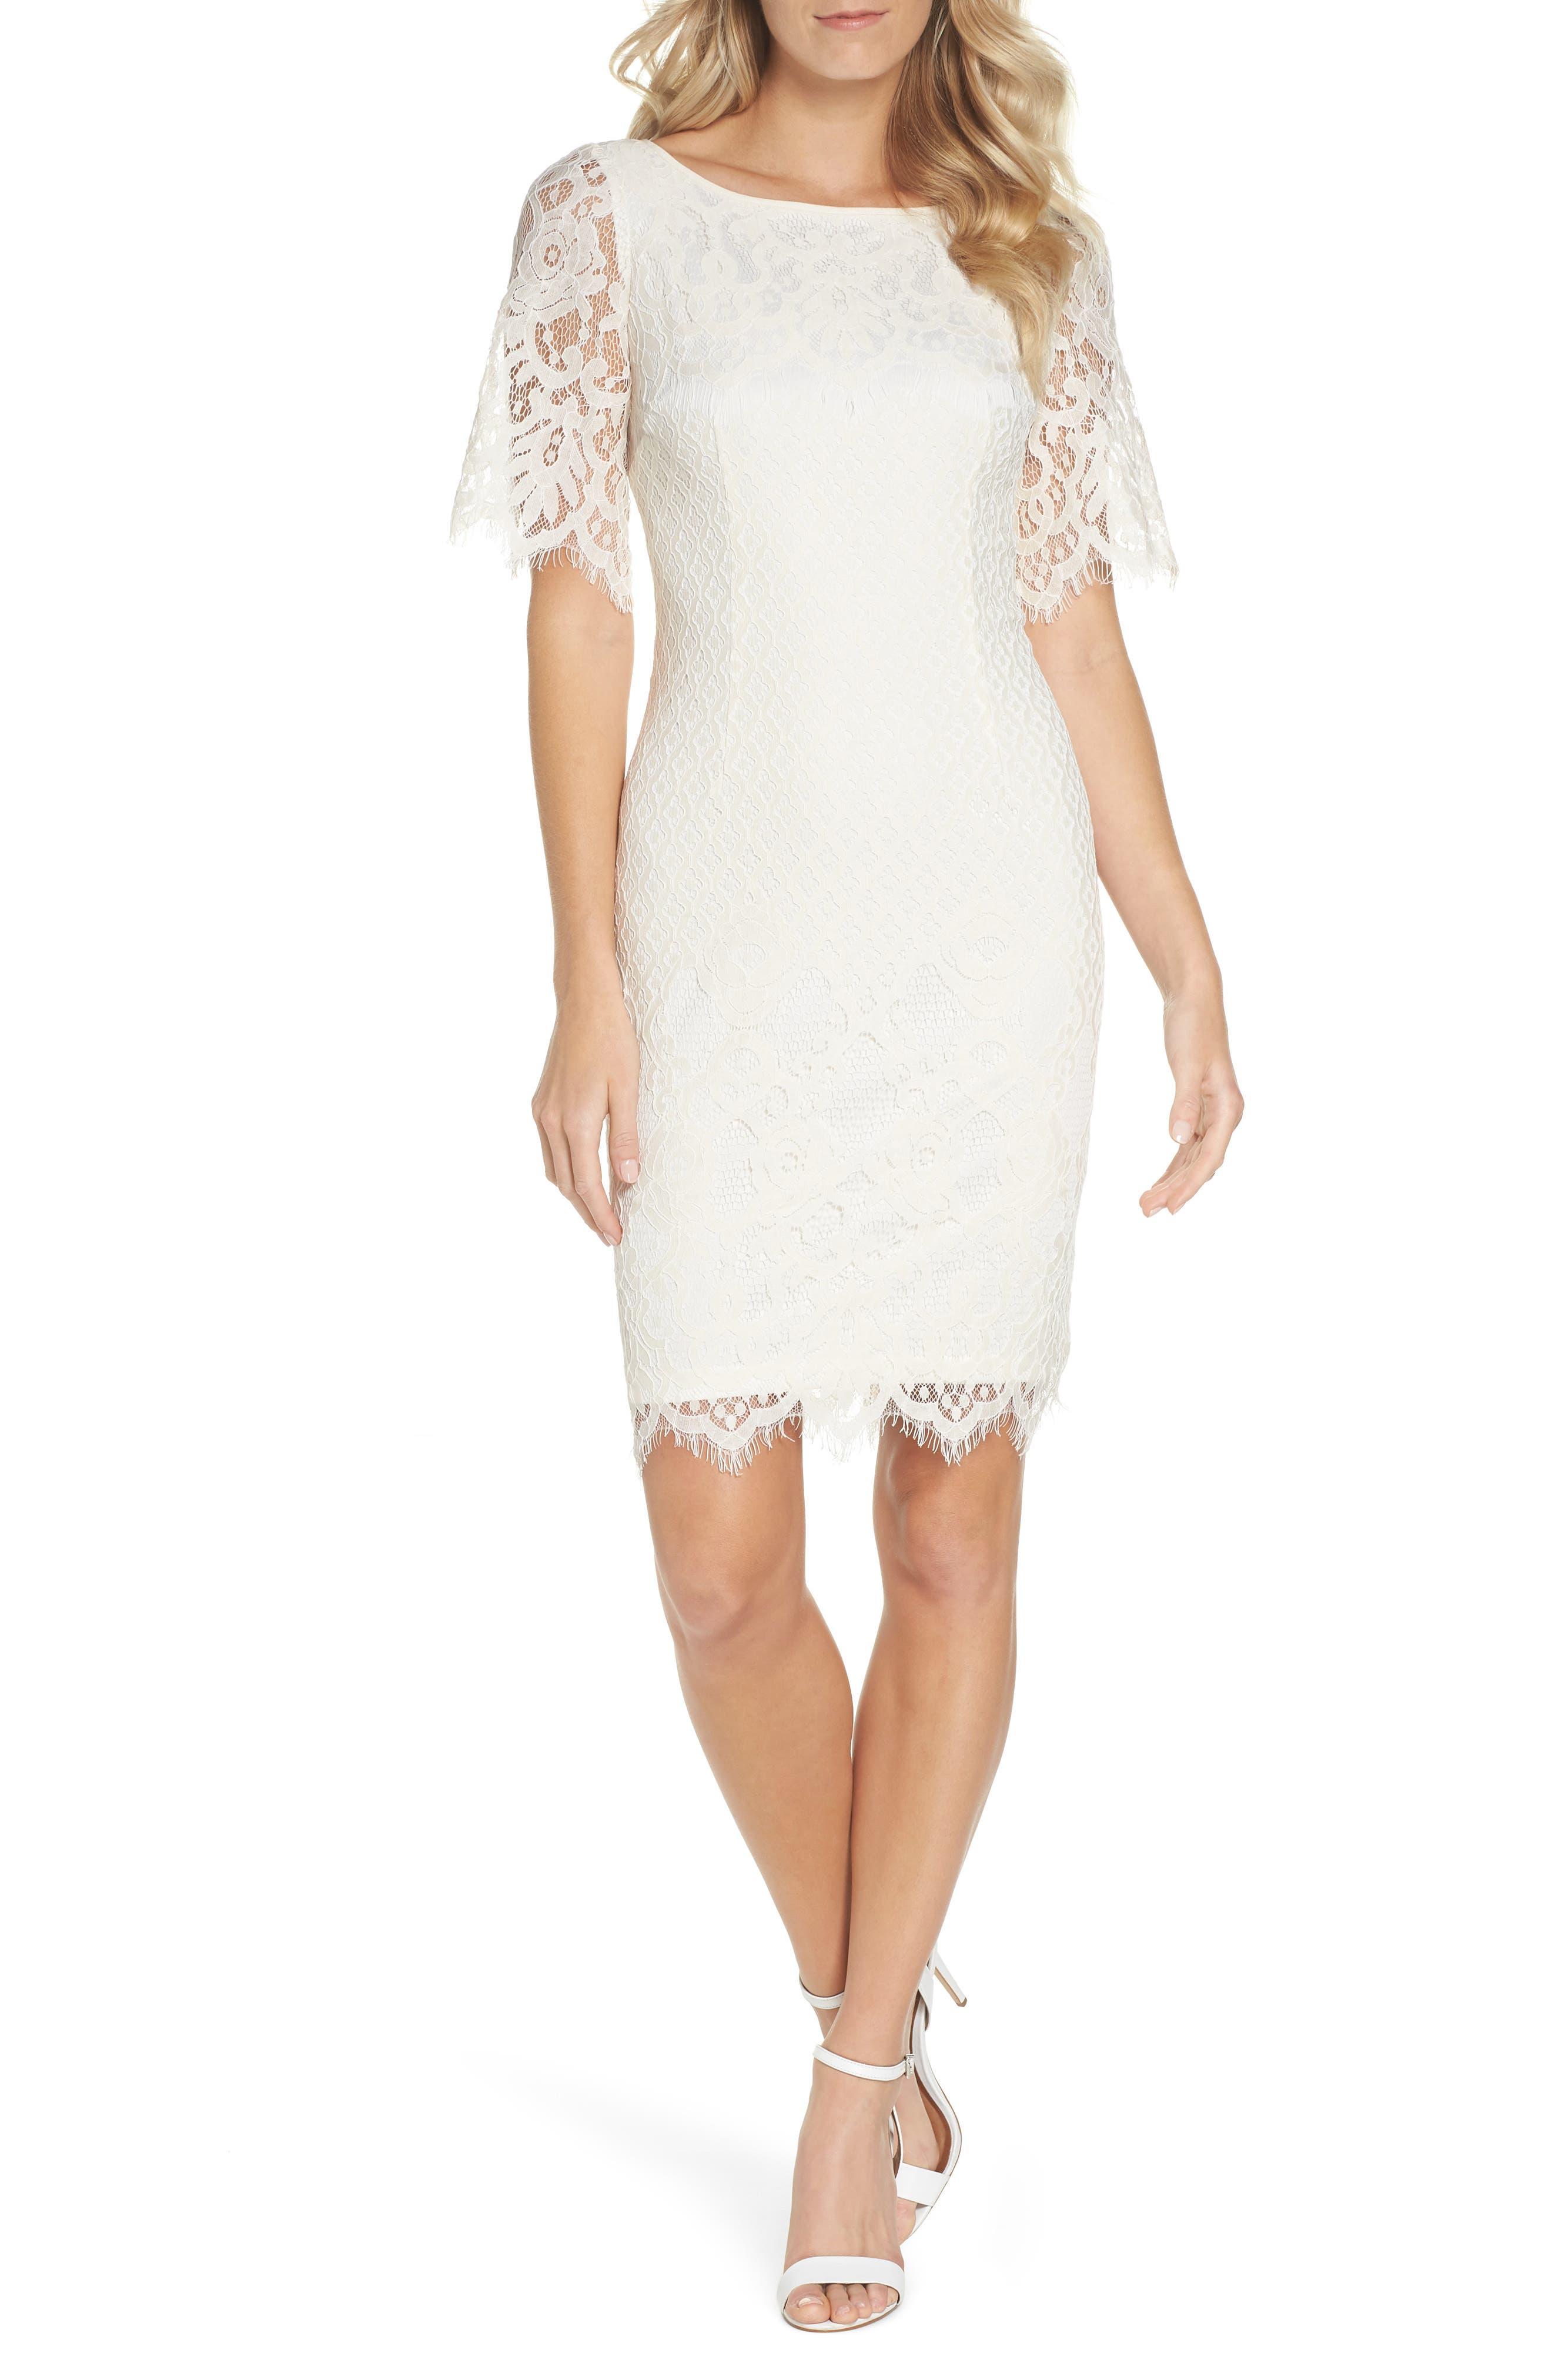 Georgia Scalloped Lace Sheath Dress,                             Main thumbnail 1, color,                             Ivory